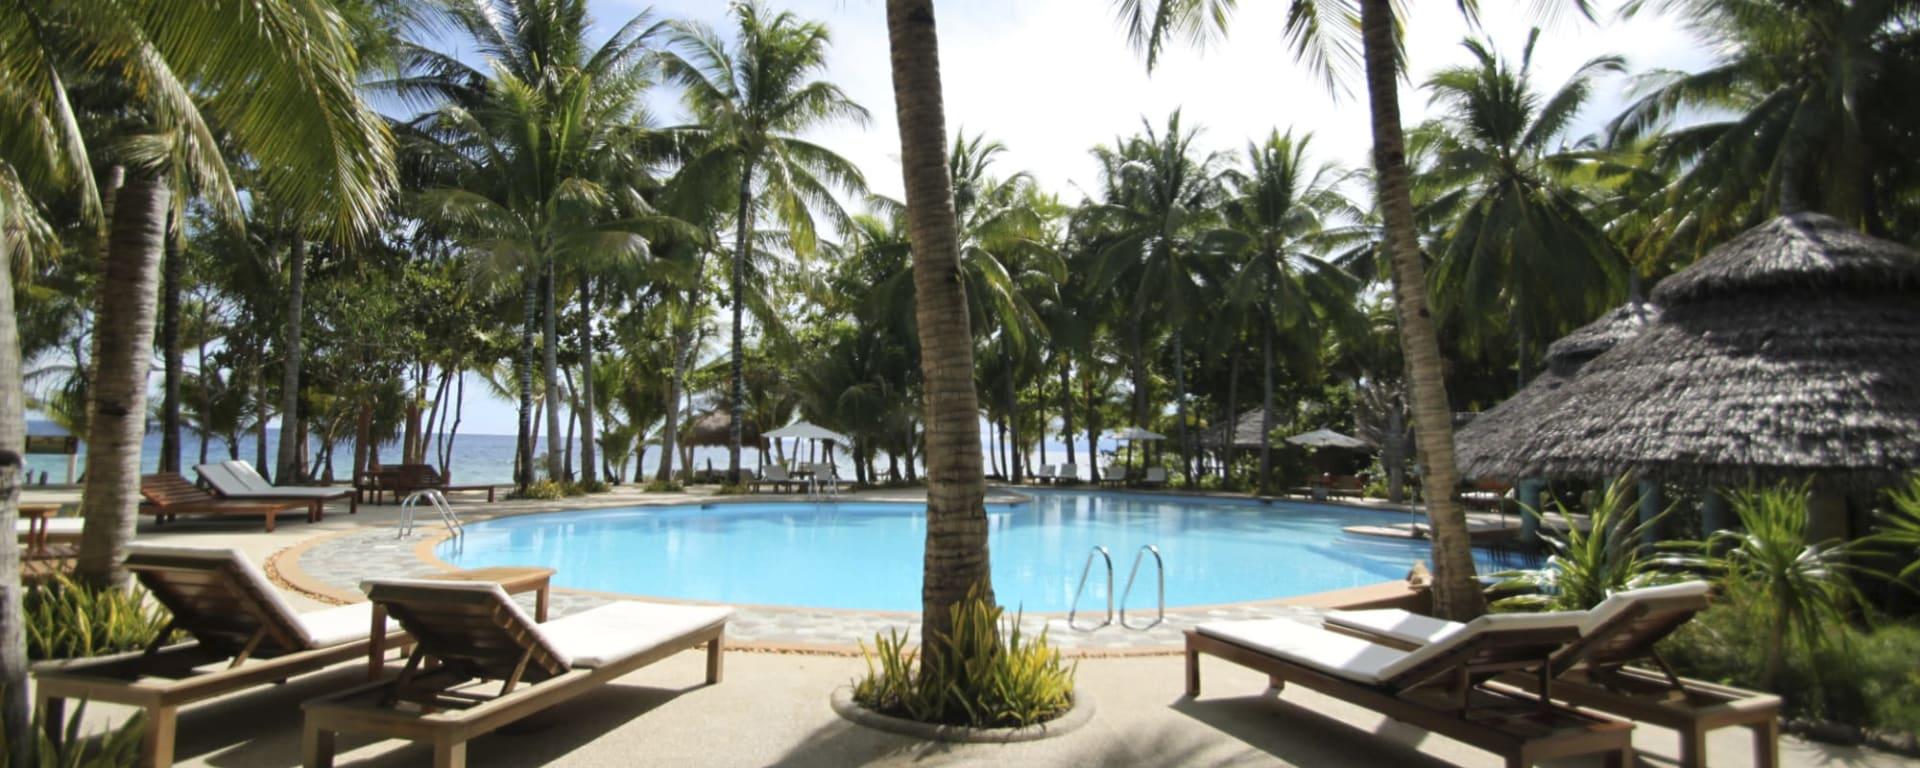 Coco Grove Beach Resort in Siquijor: Coco Grove Beach Resort Pool